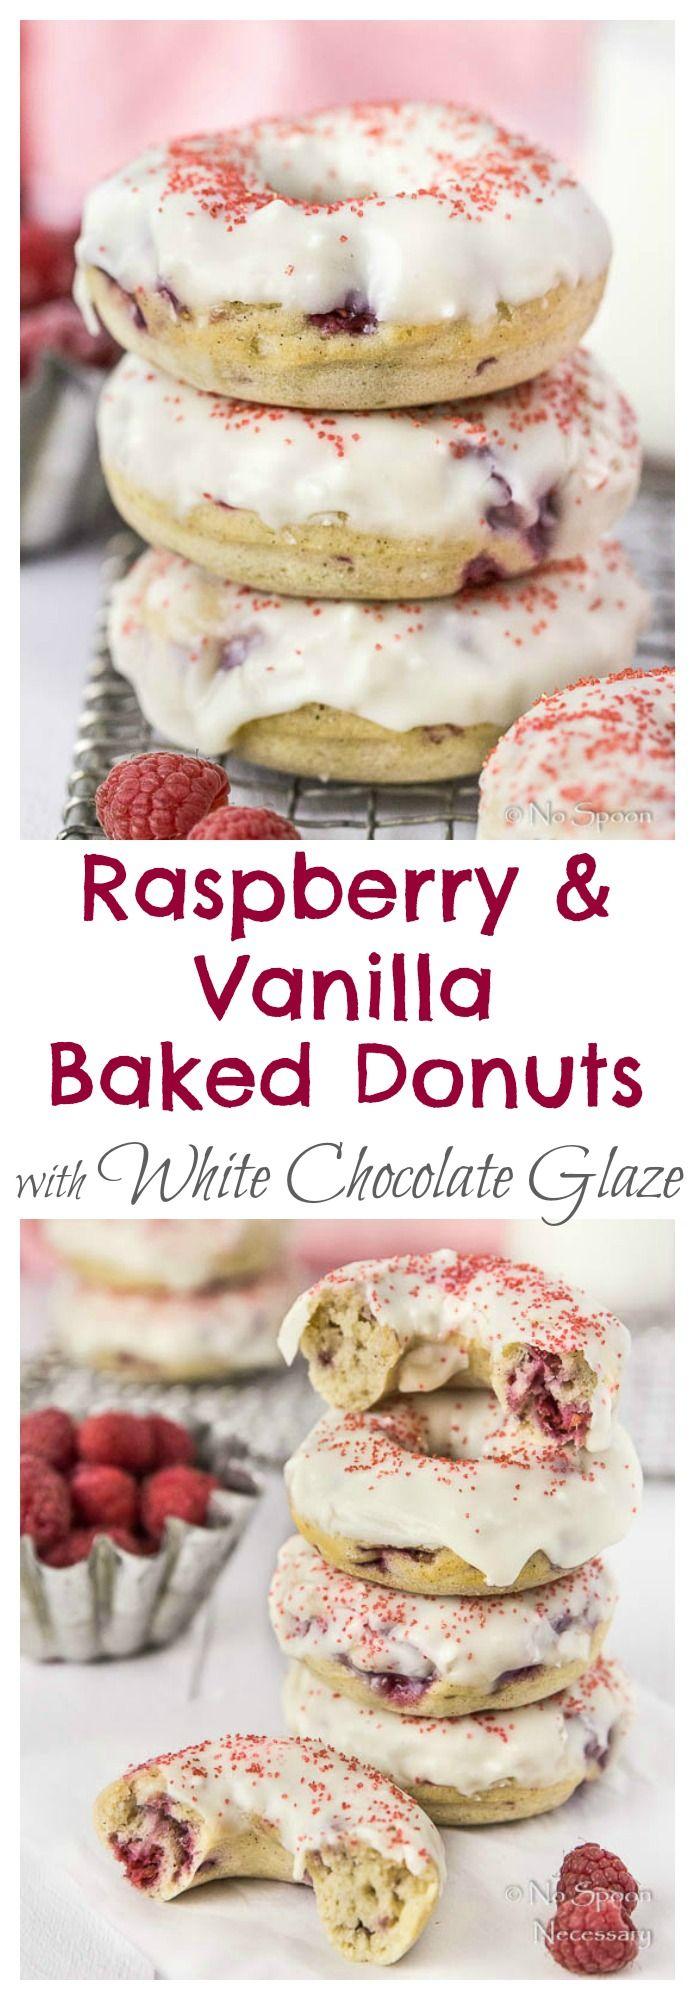 Raspberry & Vanilla Baked Donuts (with White Chocolate Glaze)